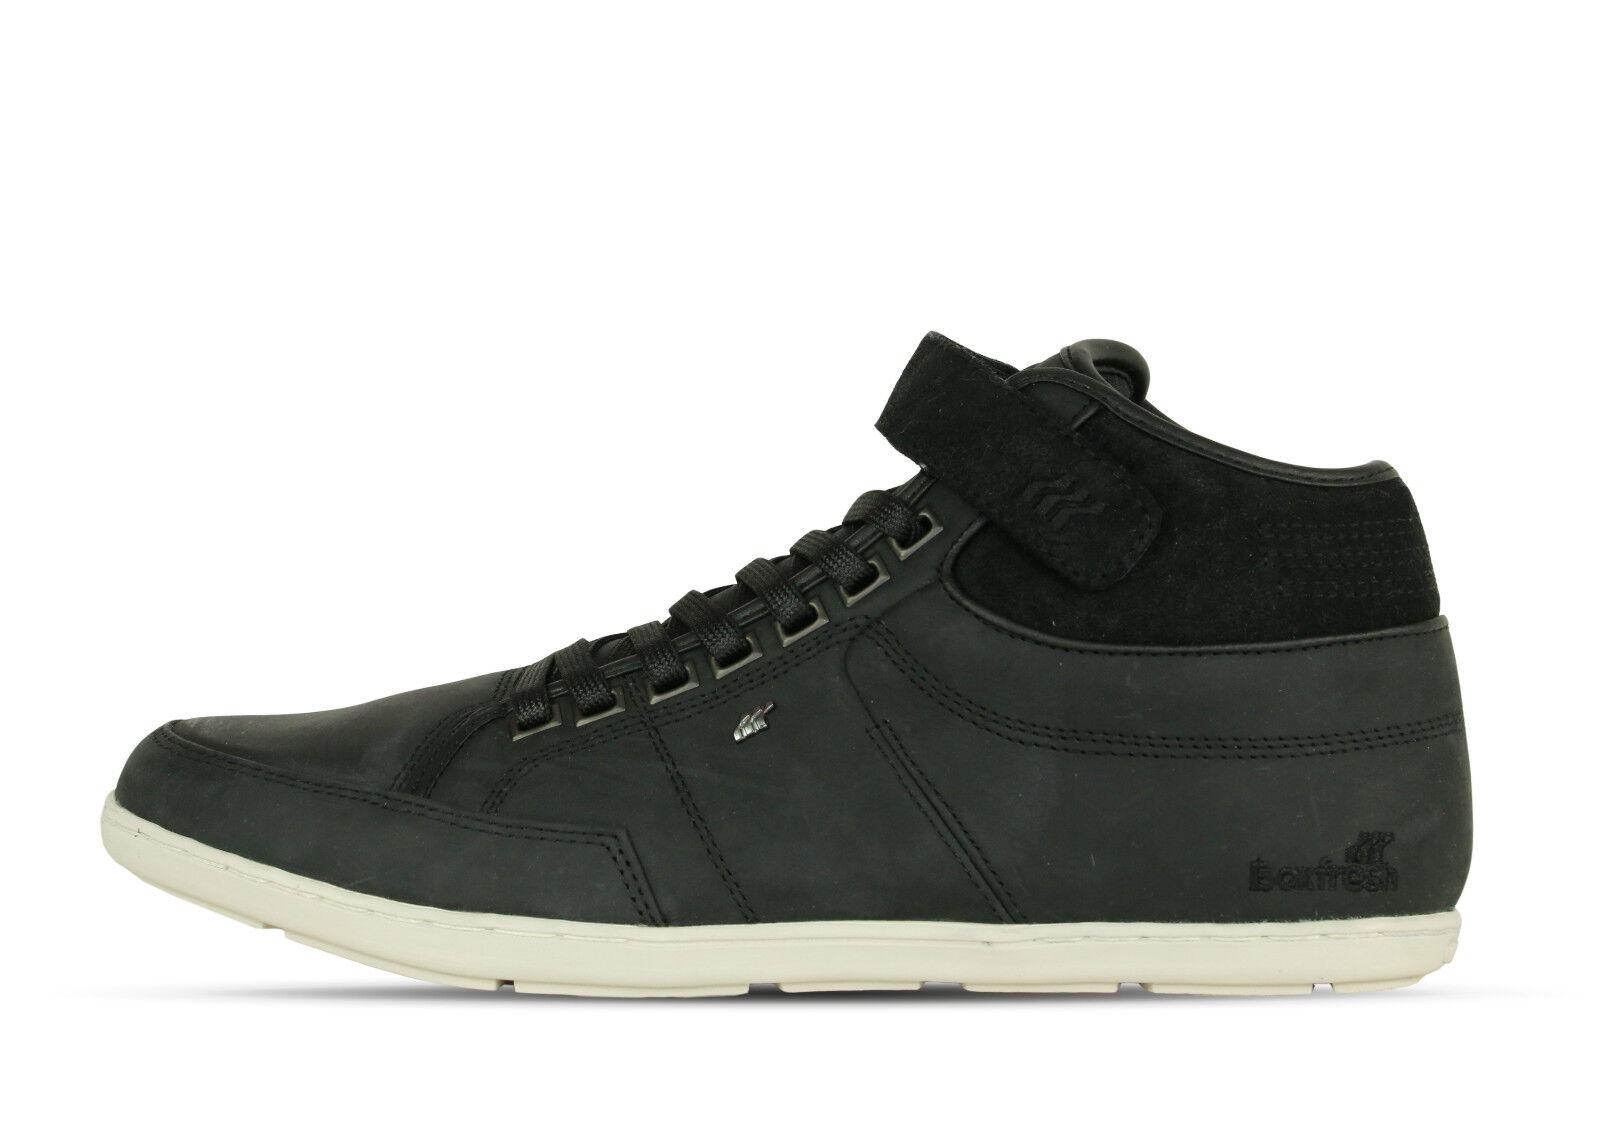 Boxfresh Swich Blok UH LEA/WXD SDE black E-14763 - Sneaker - schwarz +Neu+